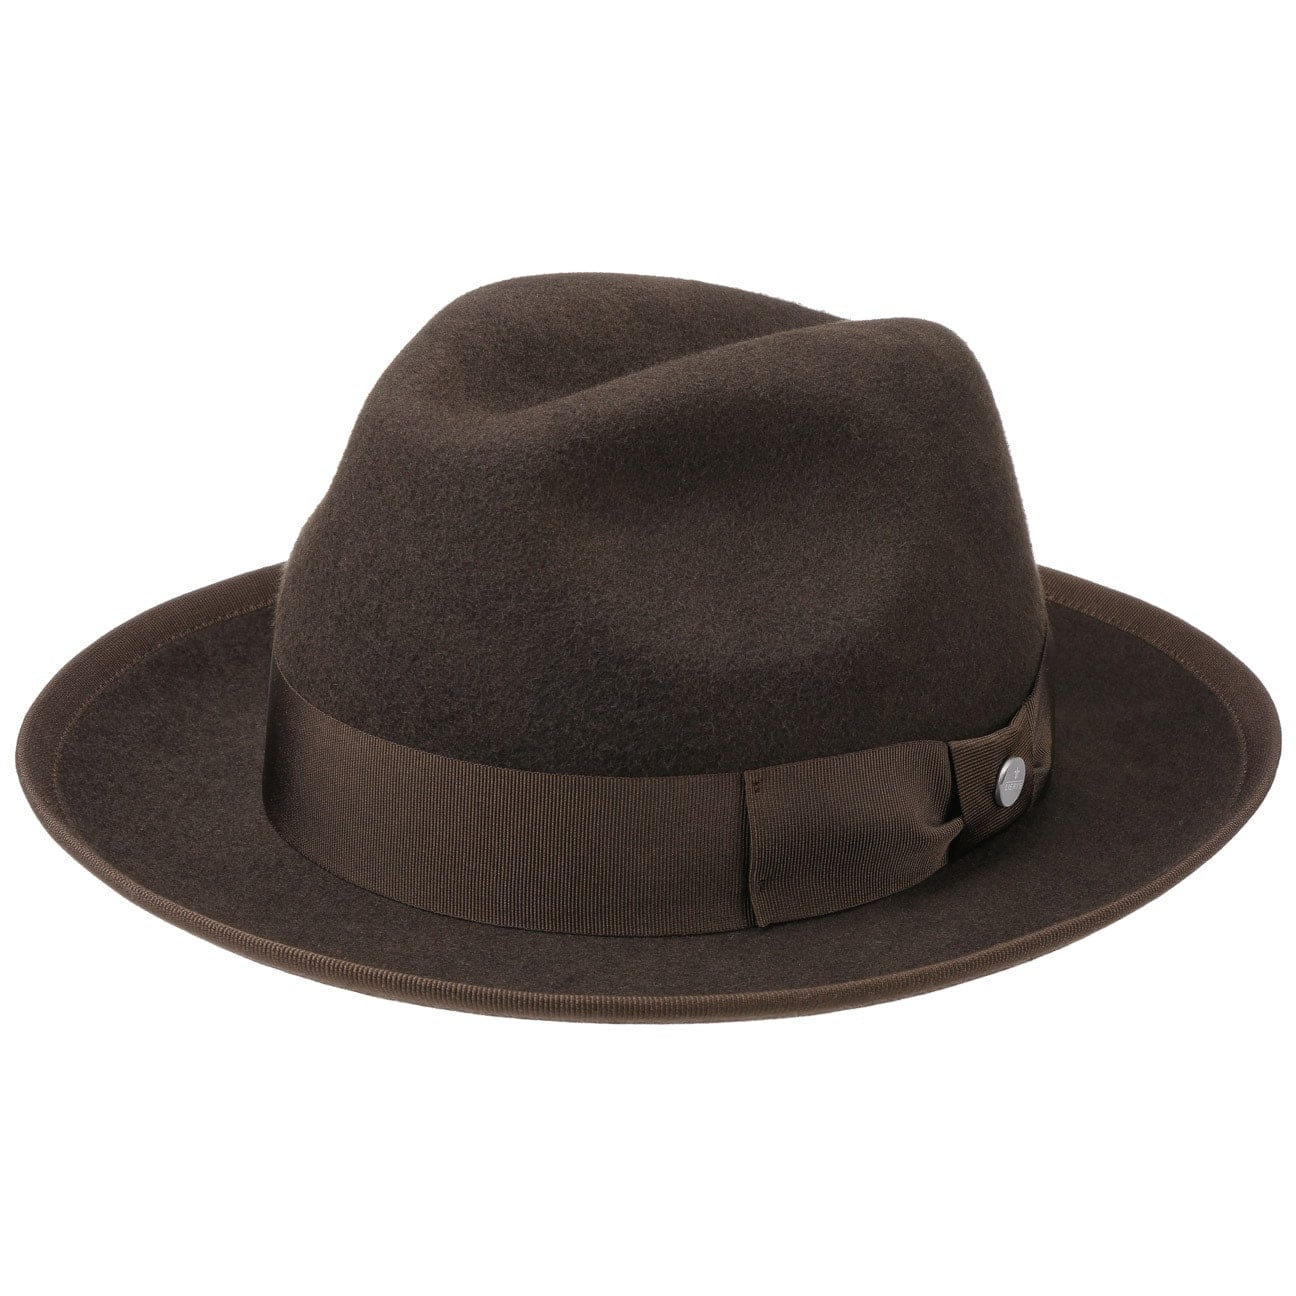 Sombrero de Fieltro Camito Light Felt by Lierys  sombrero de fieltro de lana